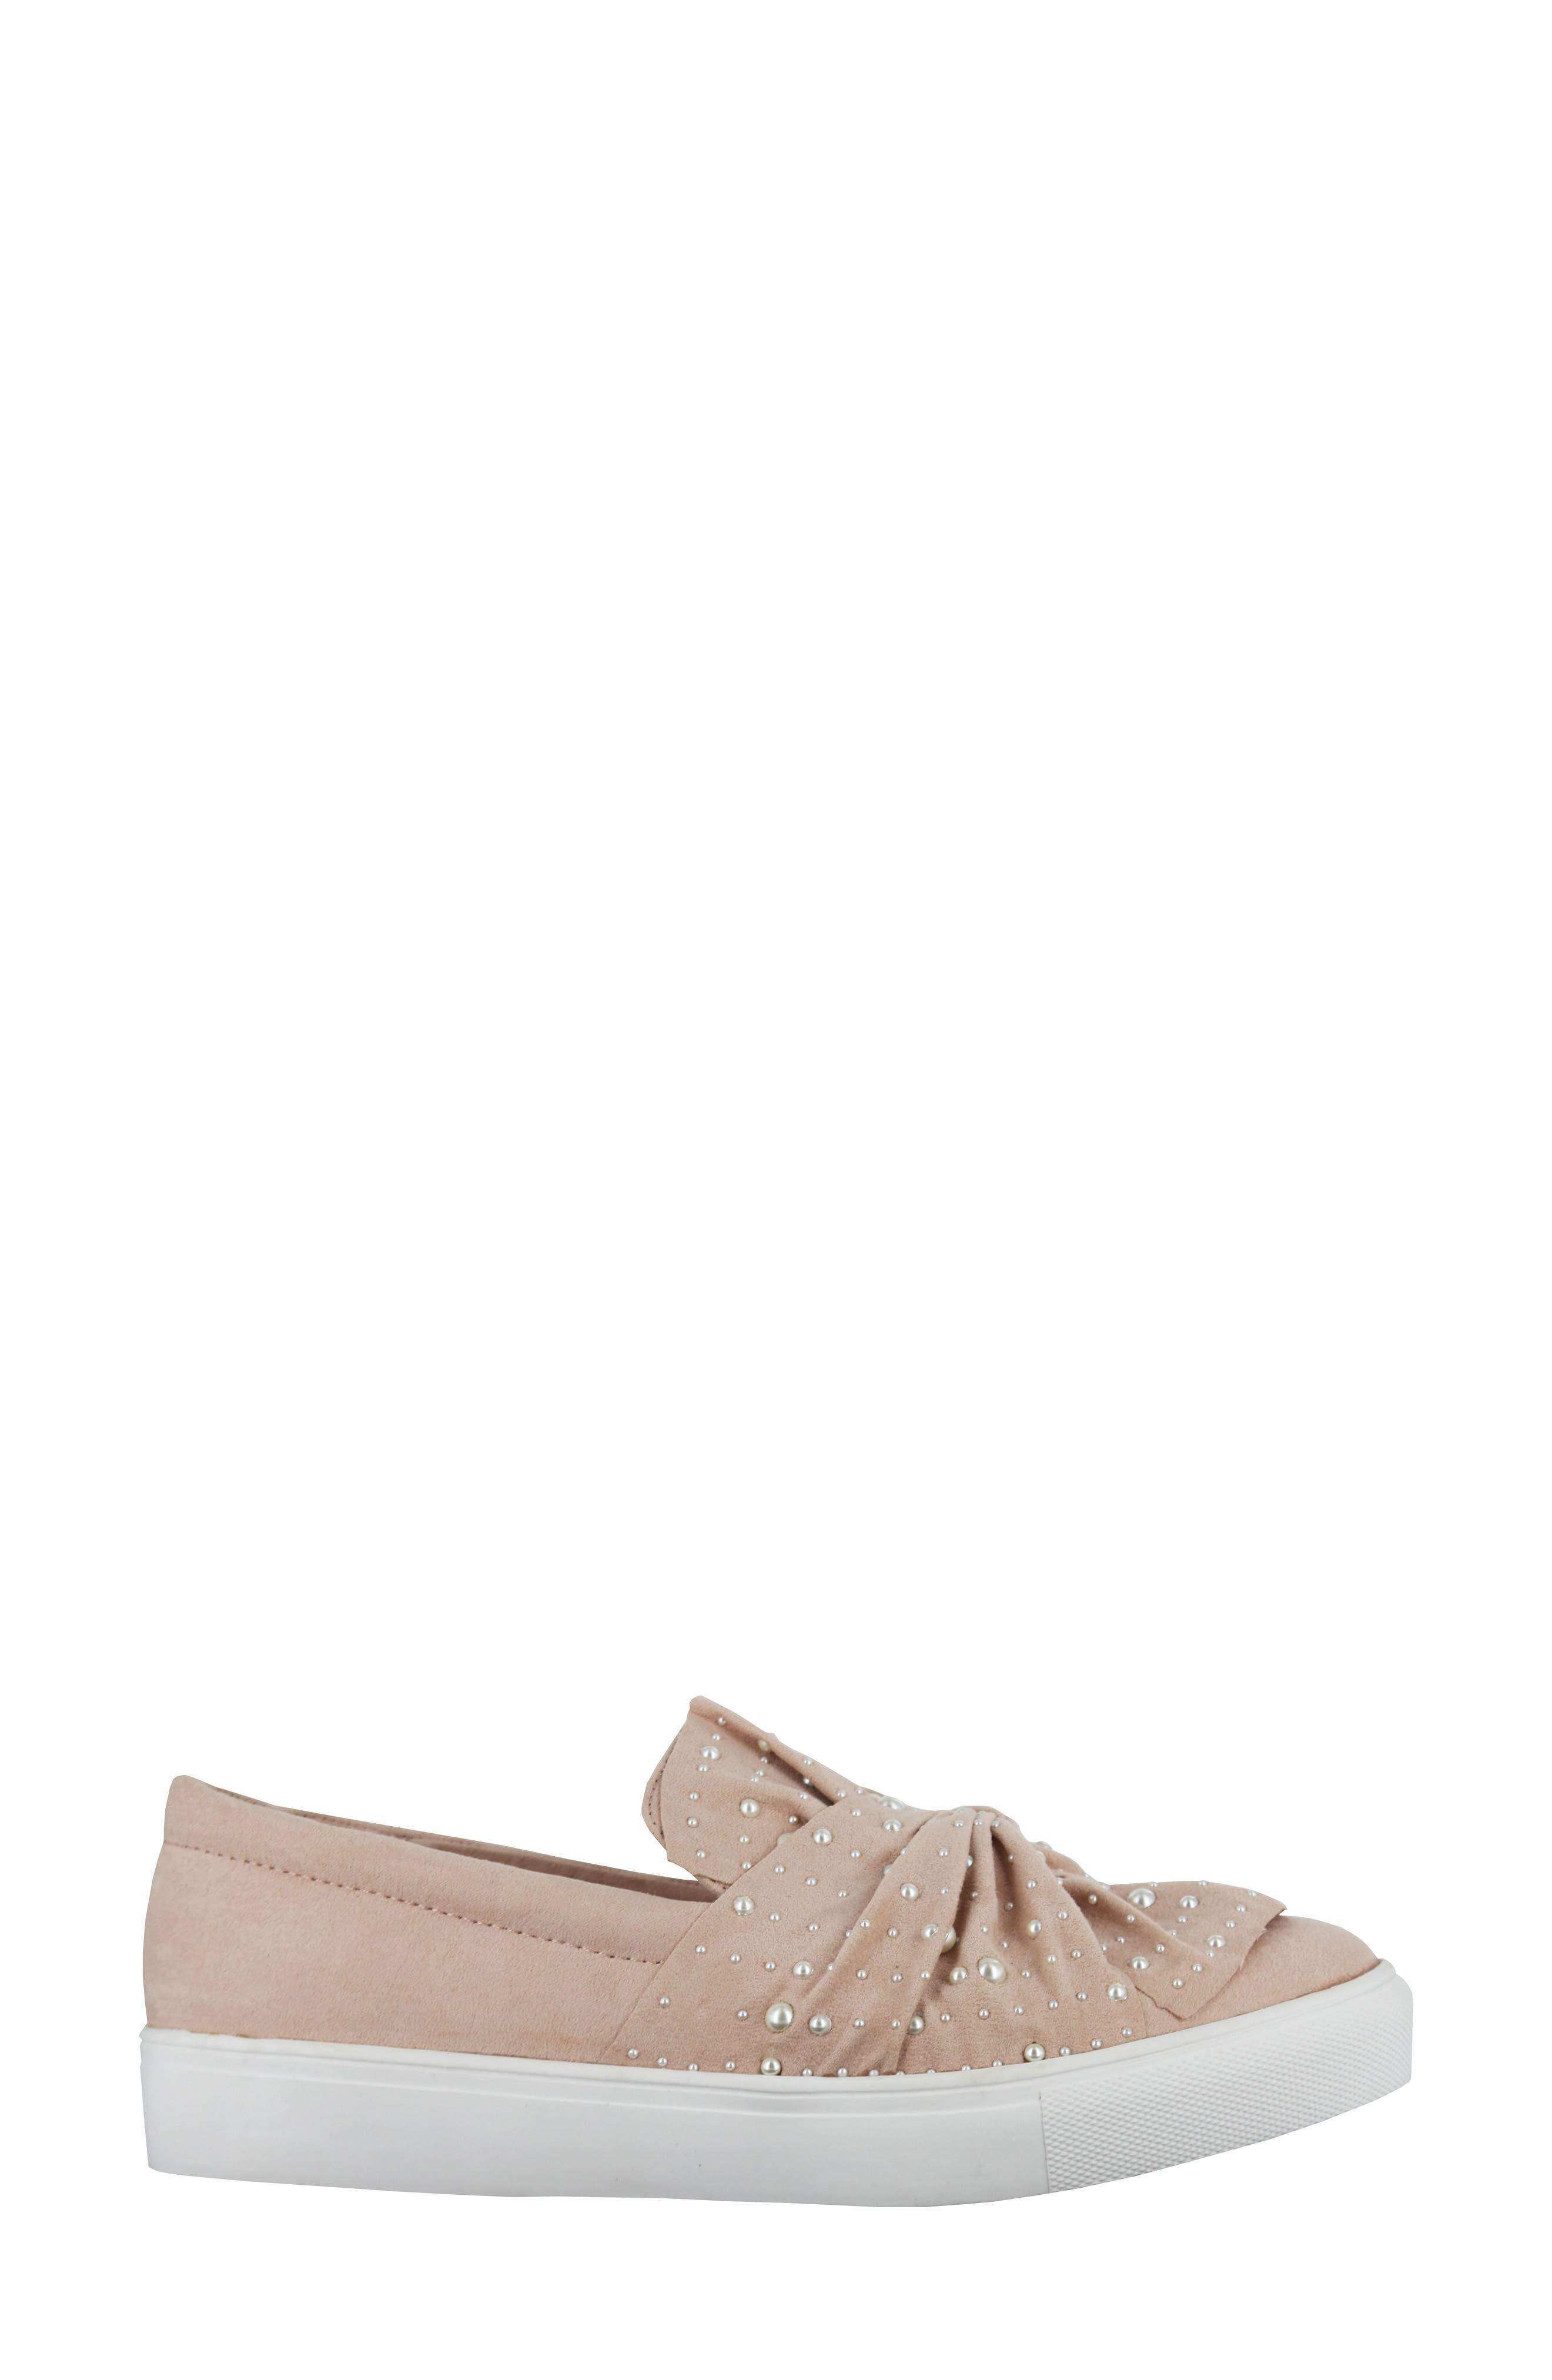 Aretha Embellished Slip-On Sneaker,                             Alternate thumbnail 4, color,